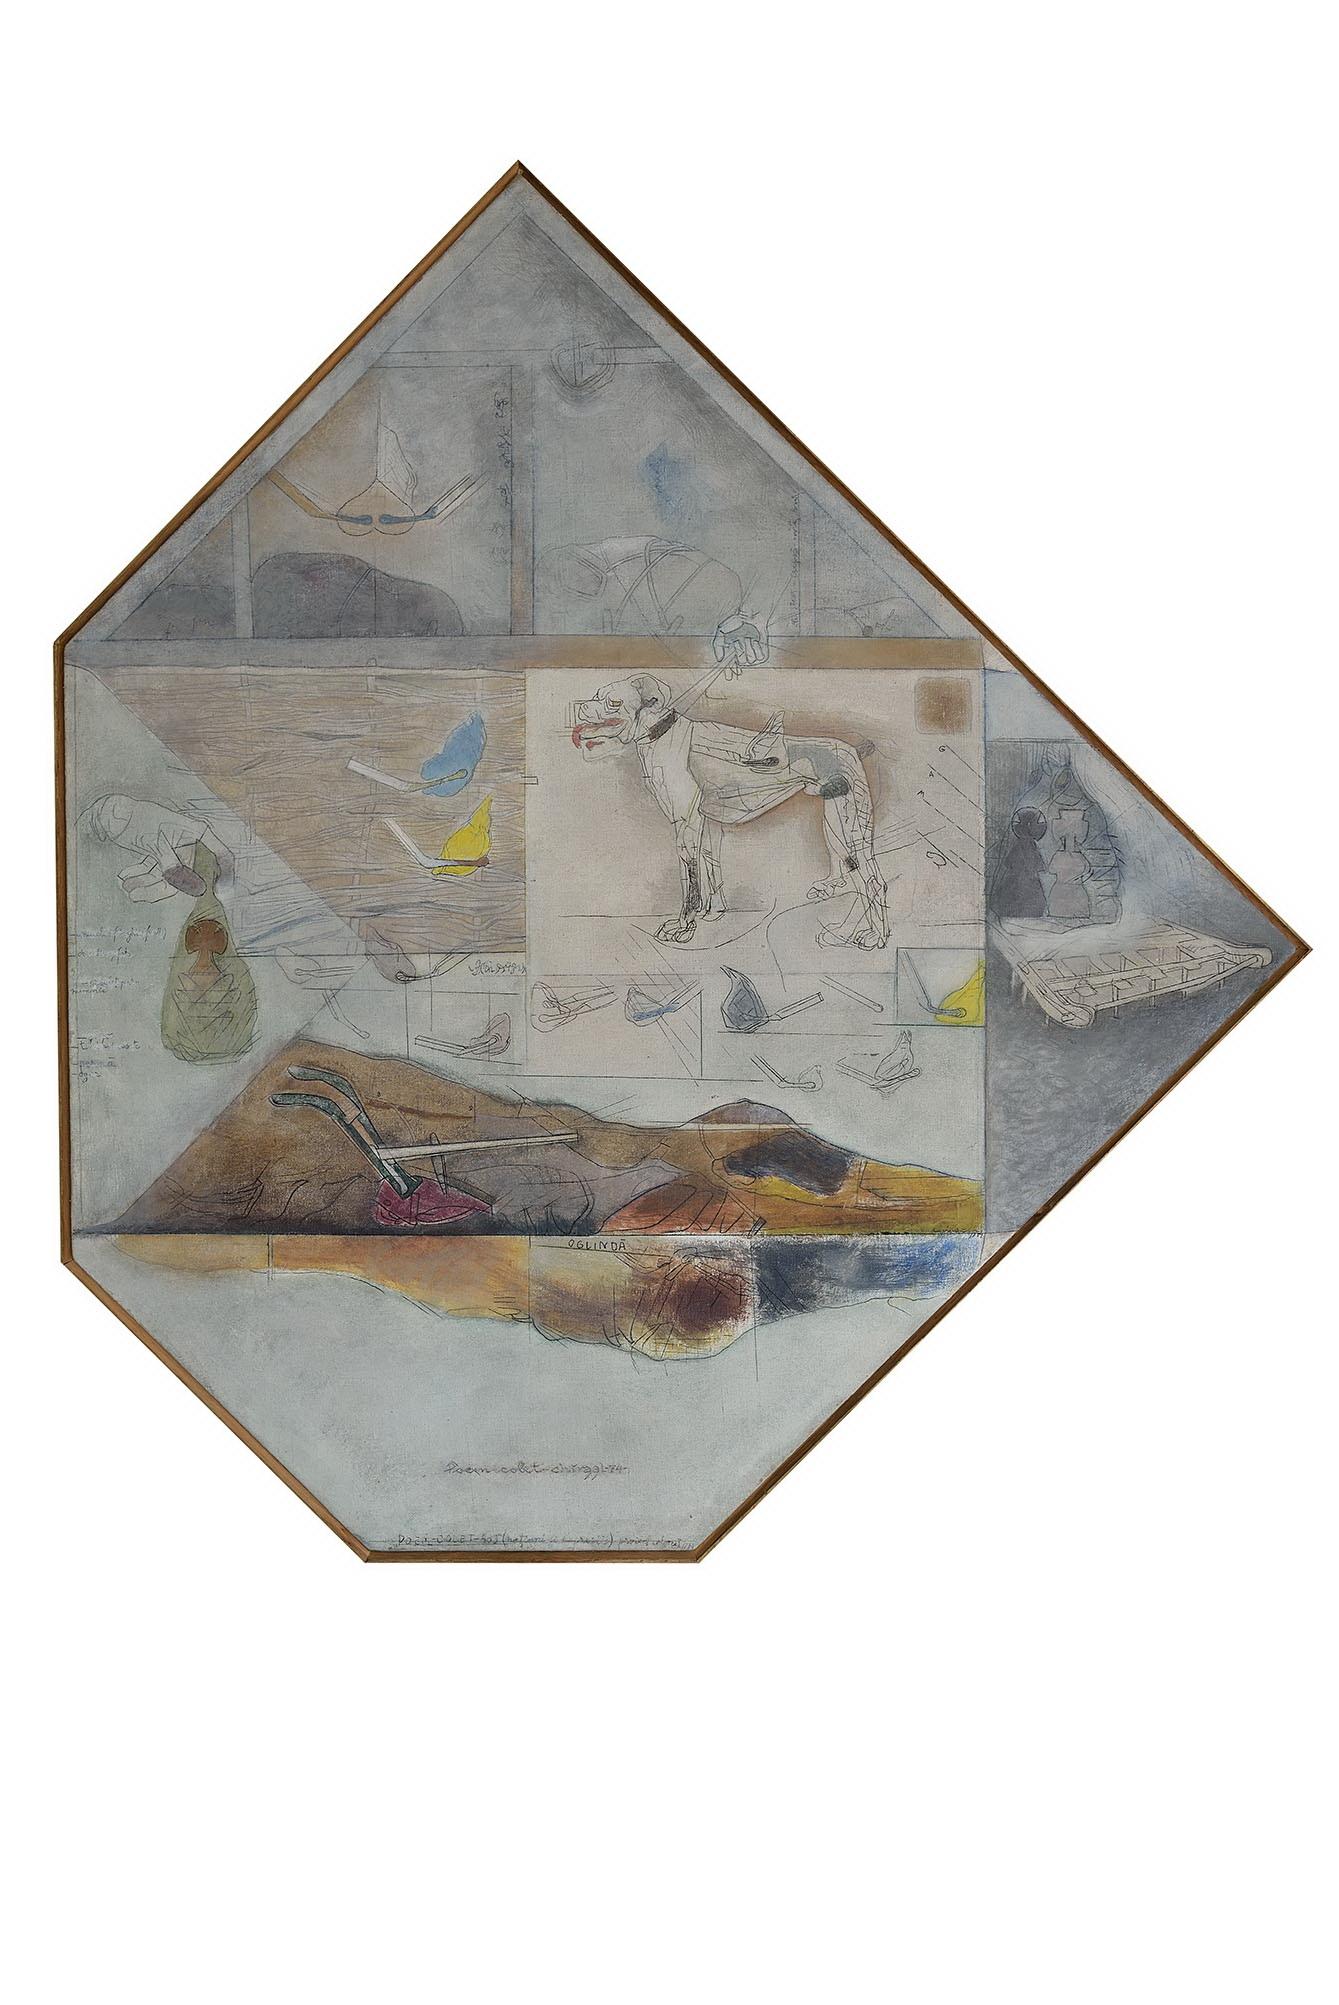 Alexandru Chira, Poem Colet, 1974